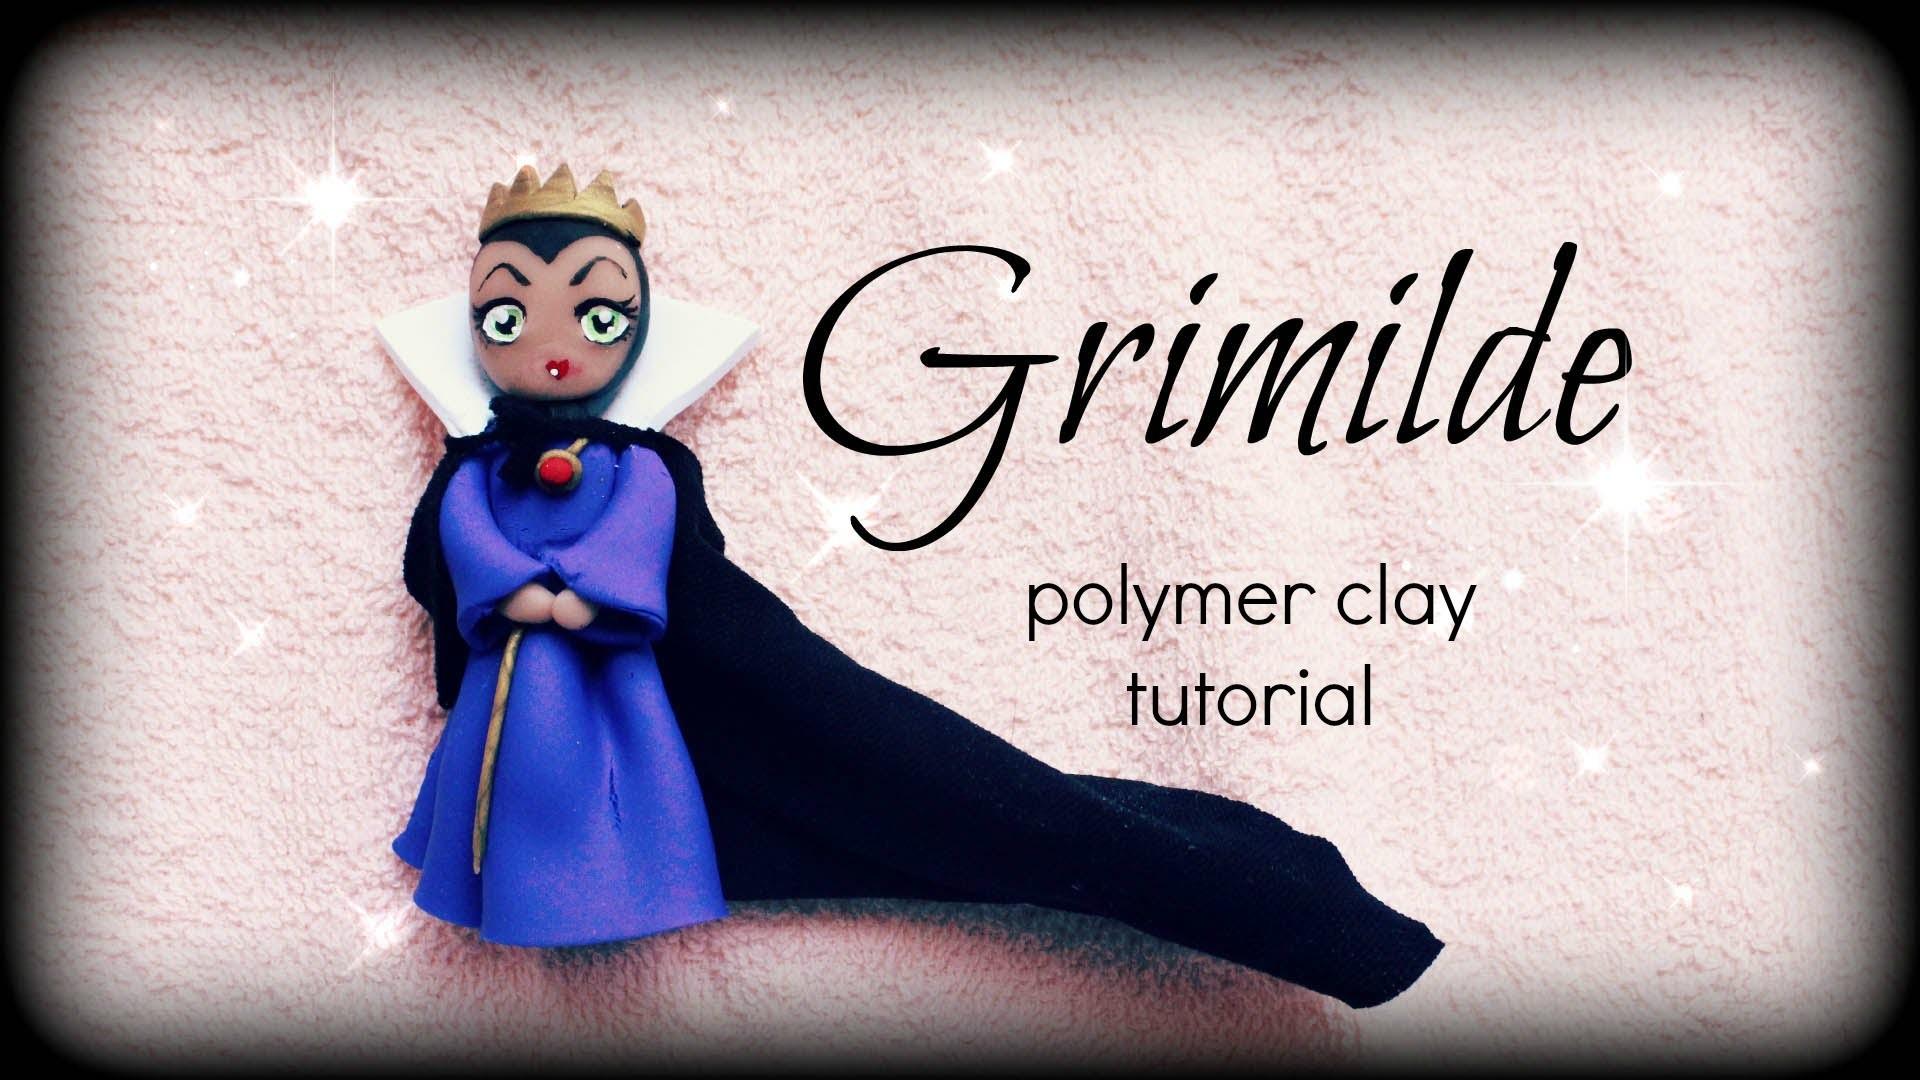 Disney Villains ● Grimilde ● Polymer Clay Doll